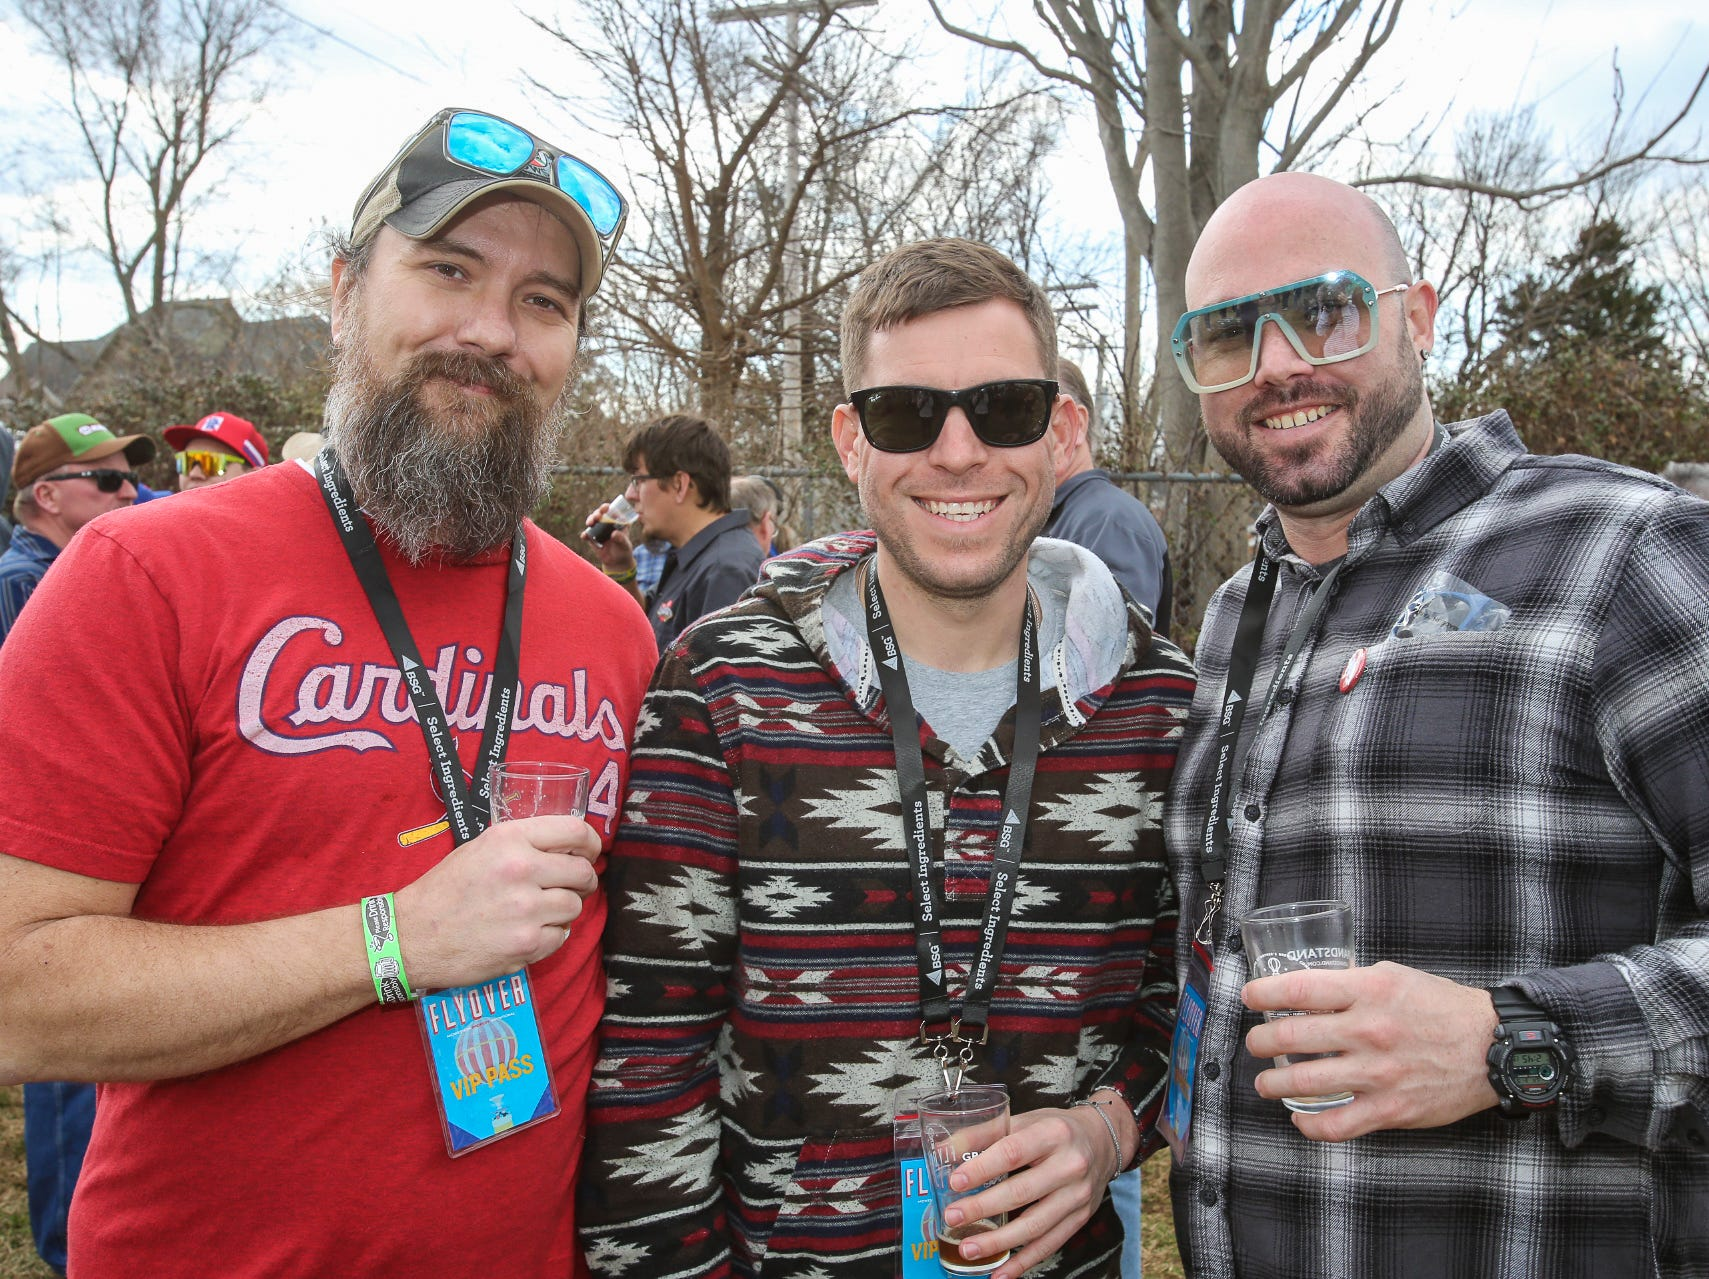 Tucker Ideker, Zack Owens and Mike Gillispie